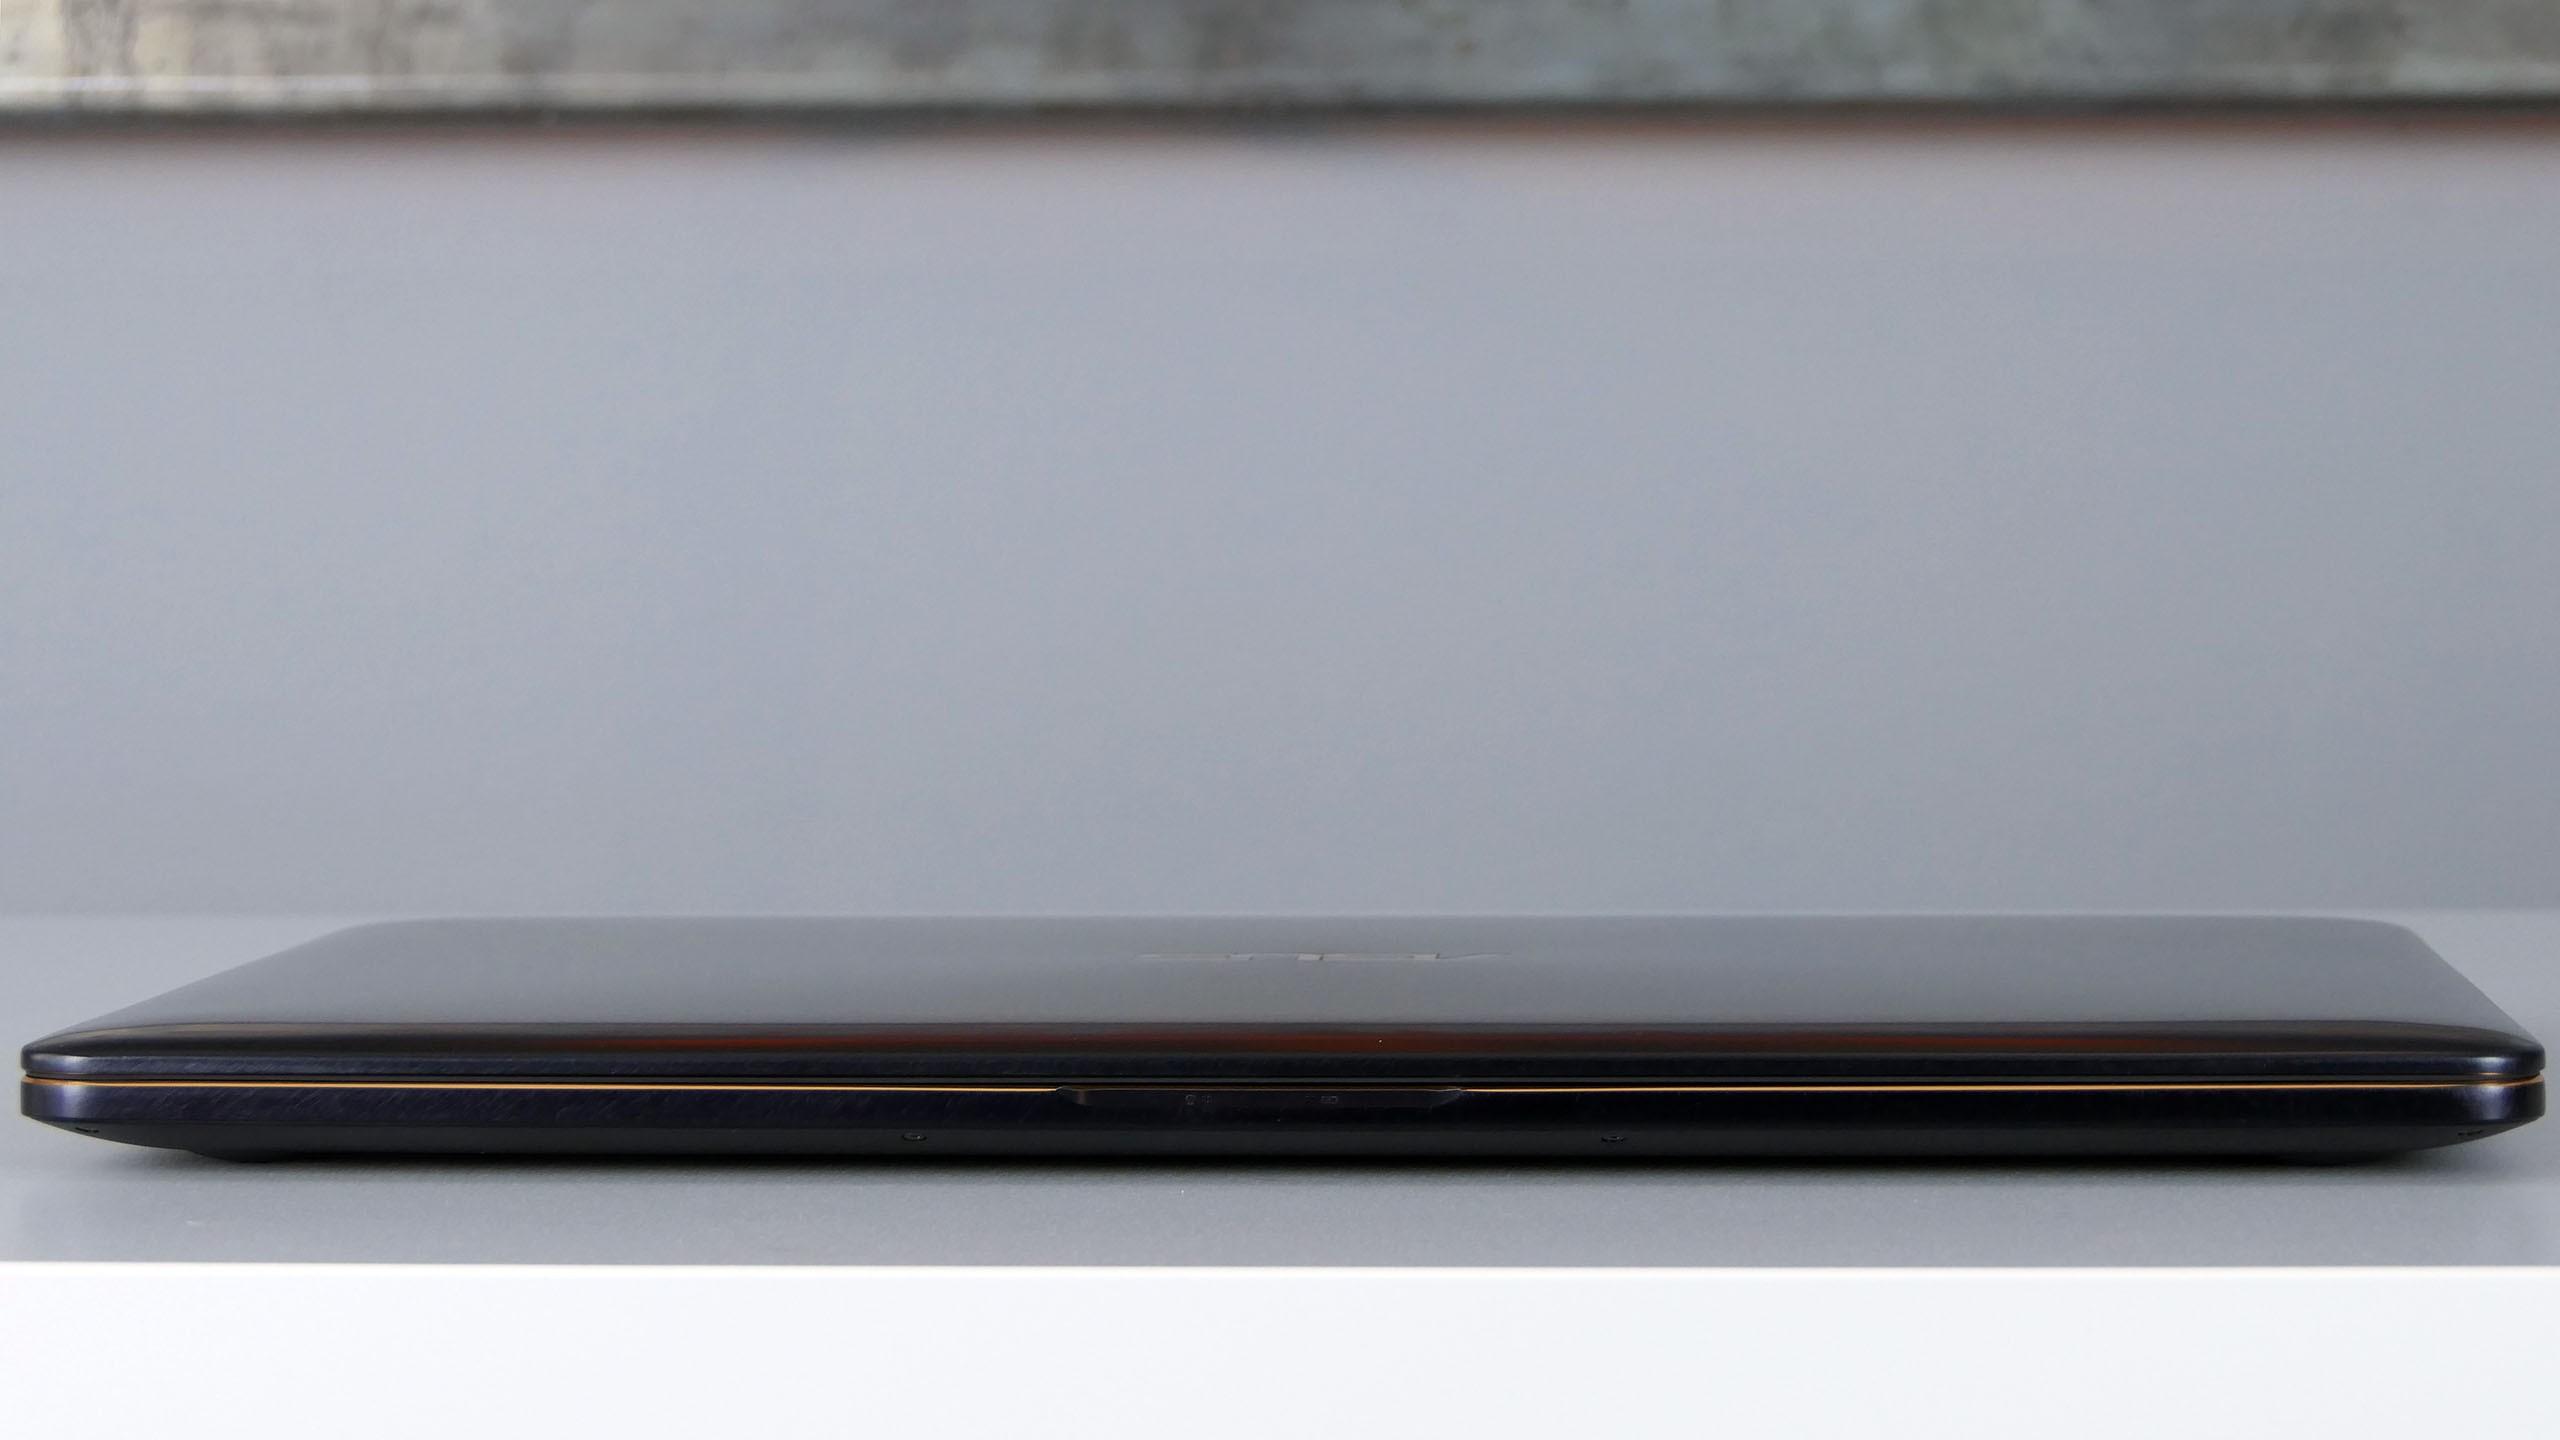 Asus ZenBook Pro 15 - przód notebooka